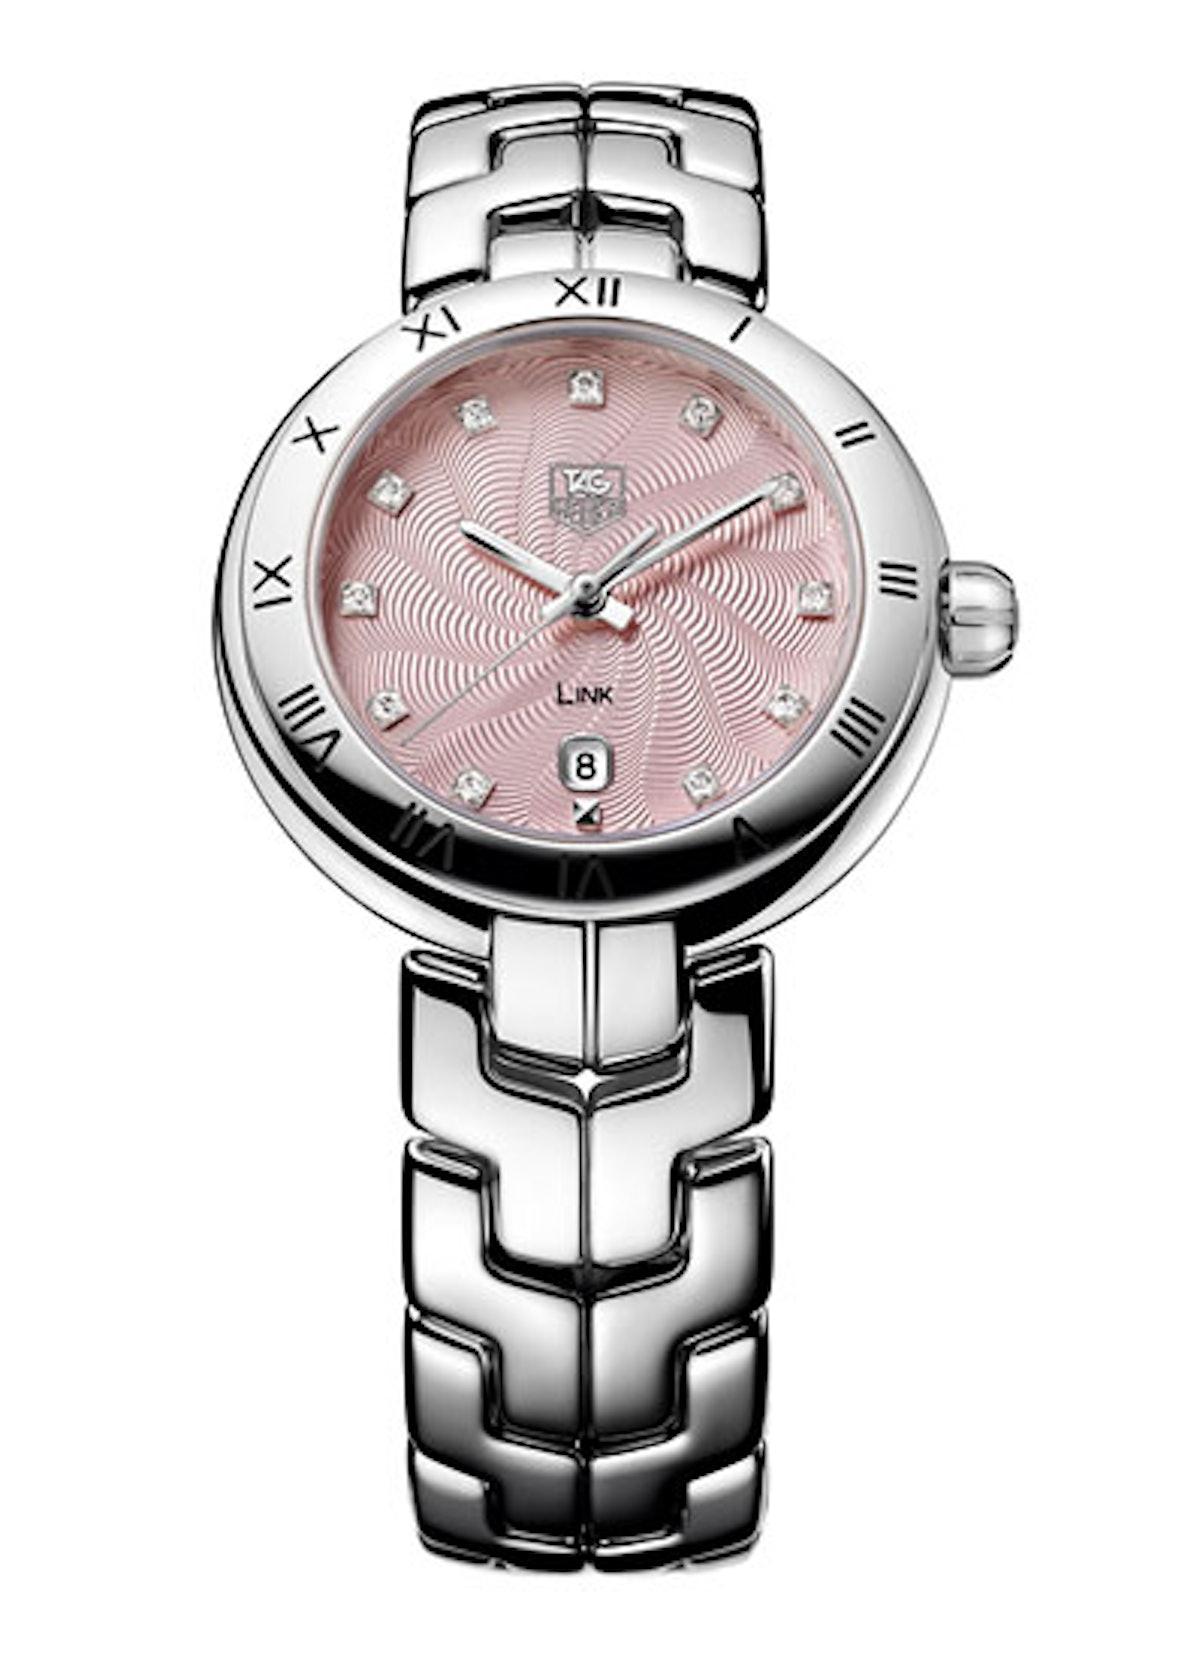 acss-basel-watches-roundup-04-v.jpg